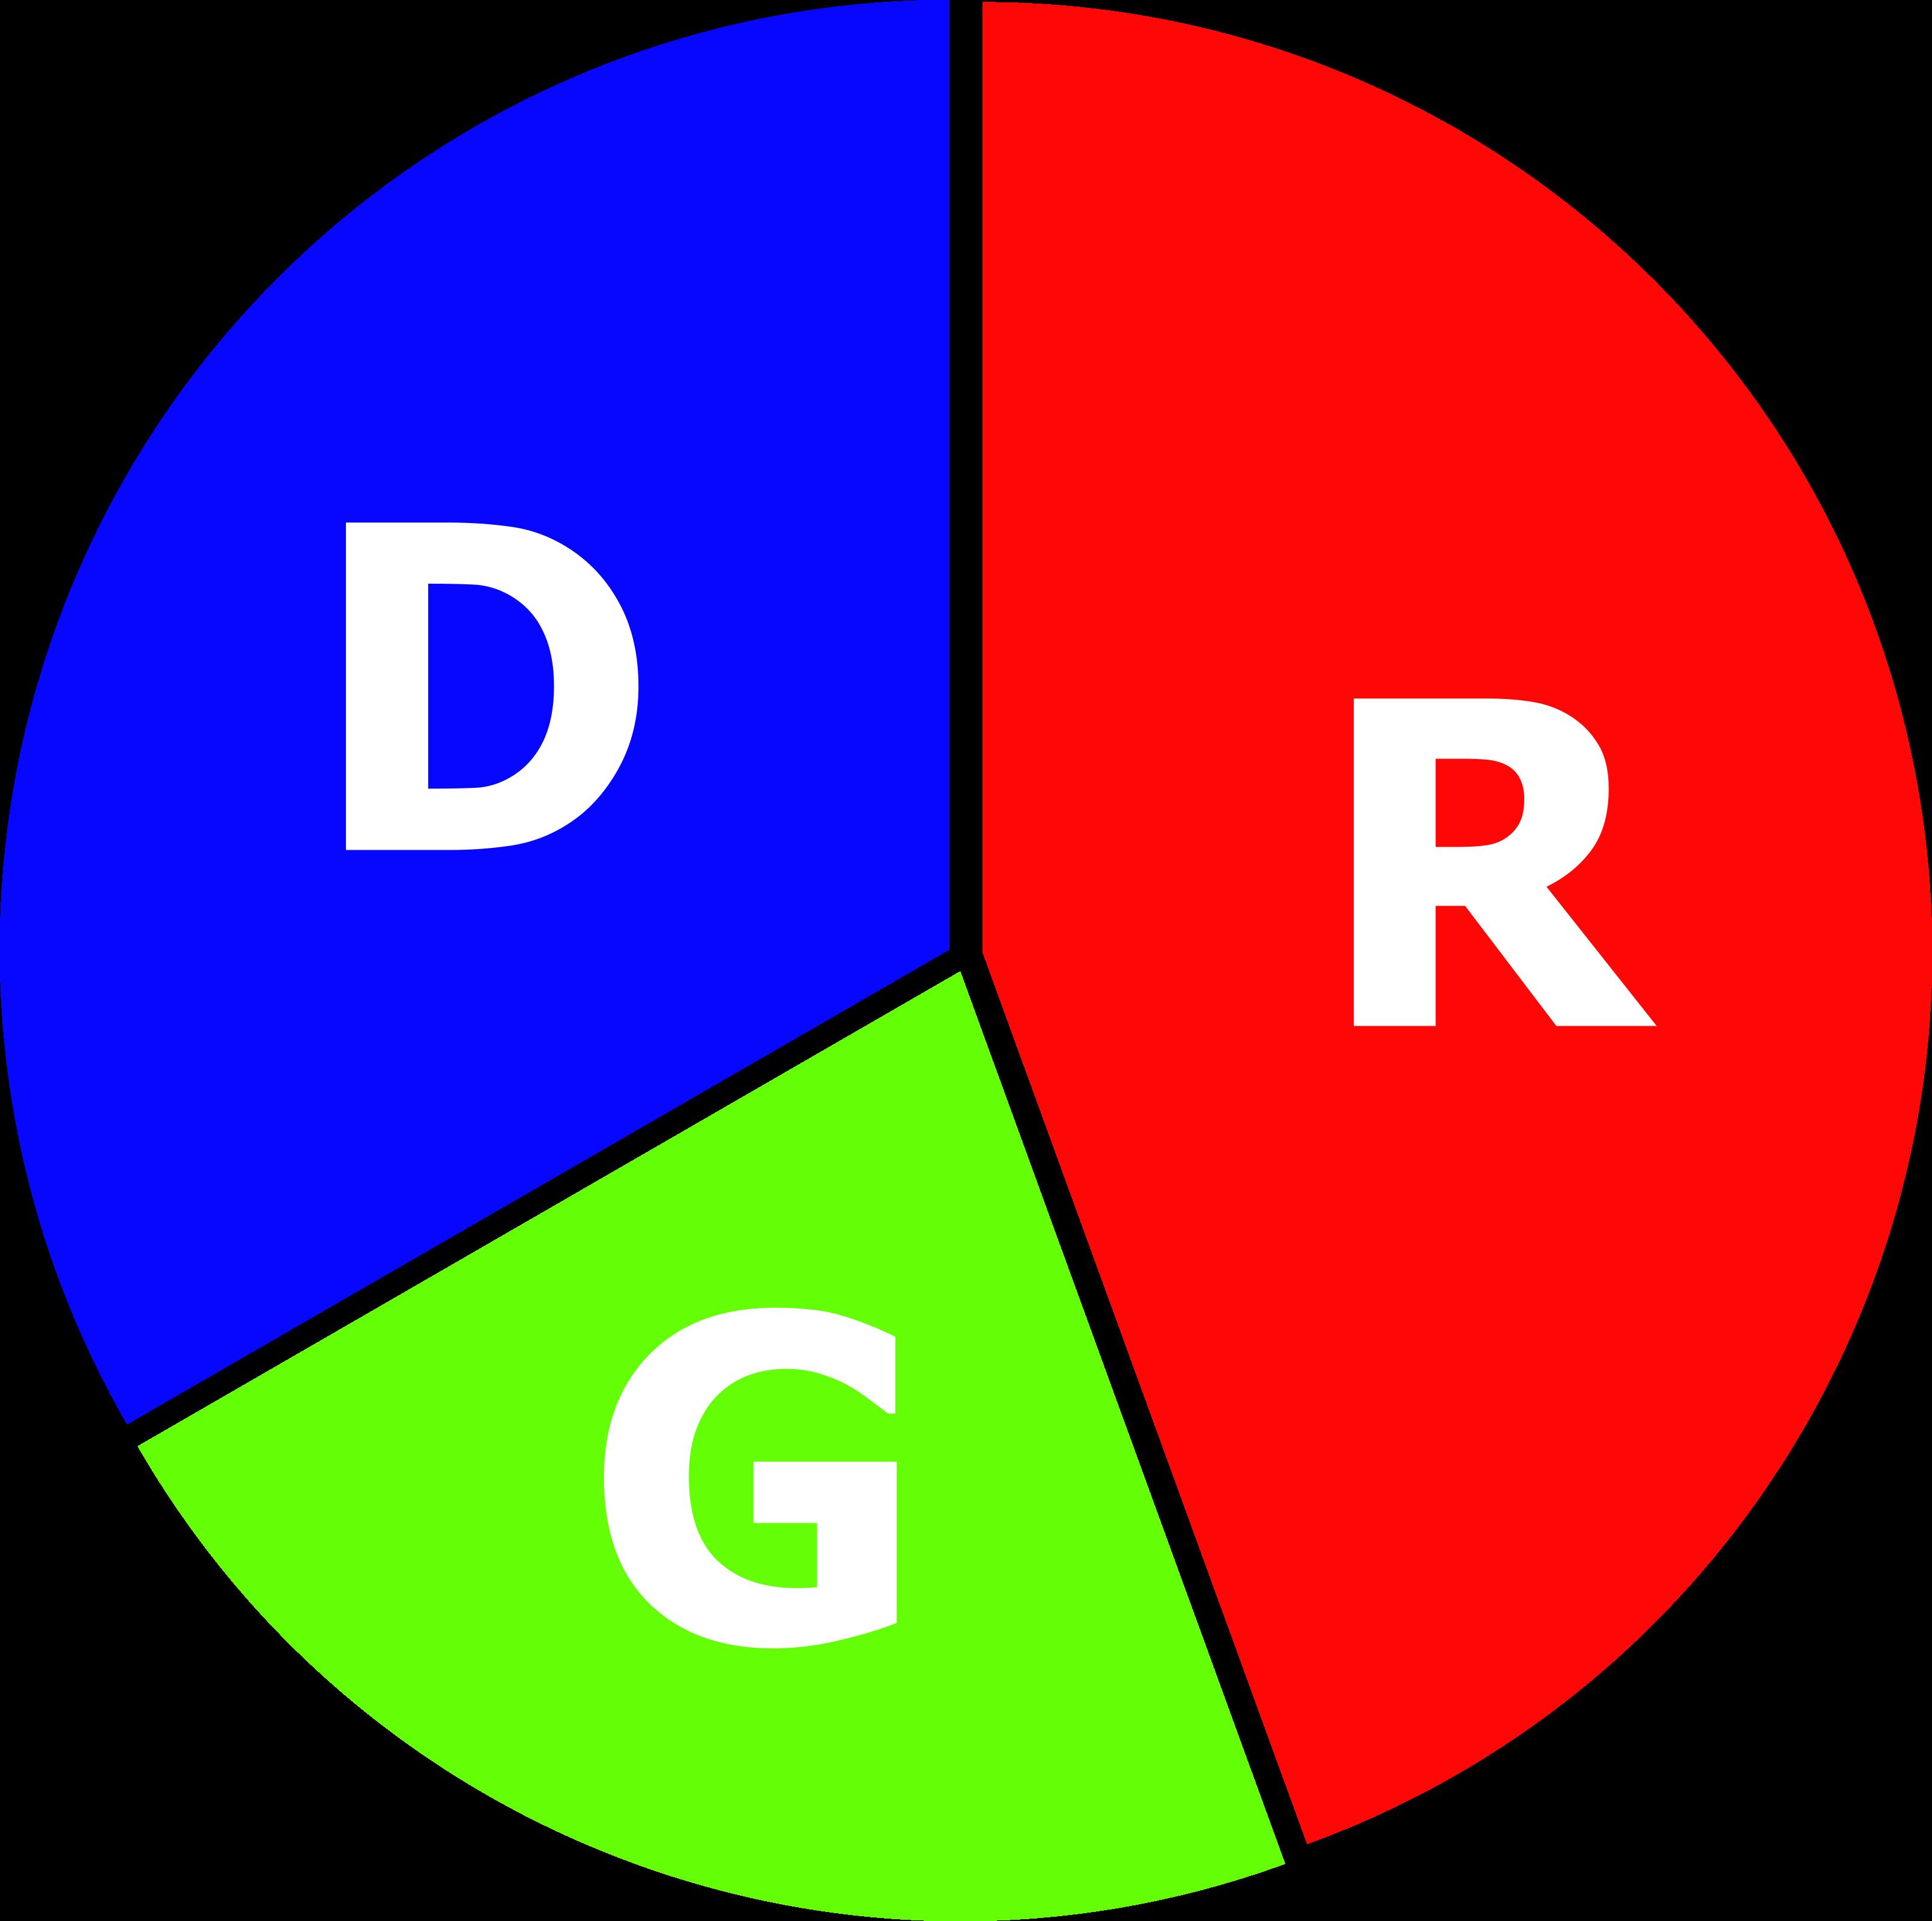 pie chart three candidates